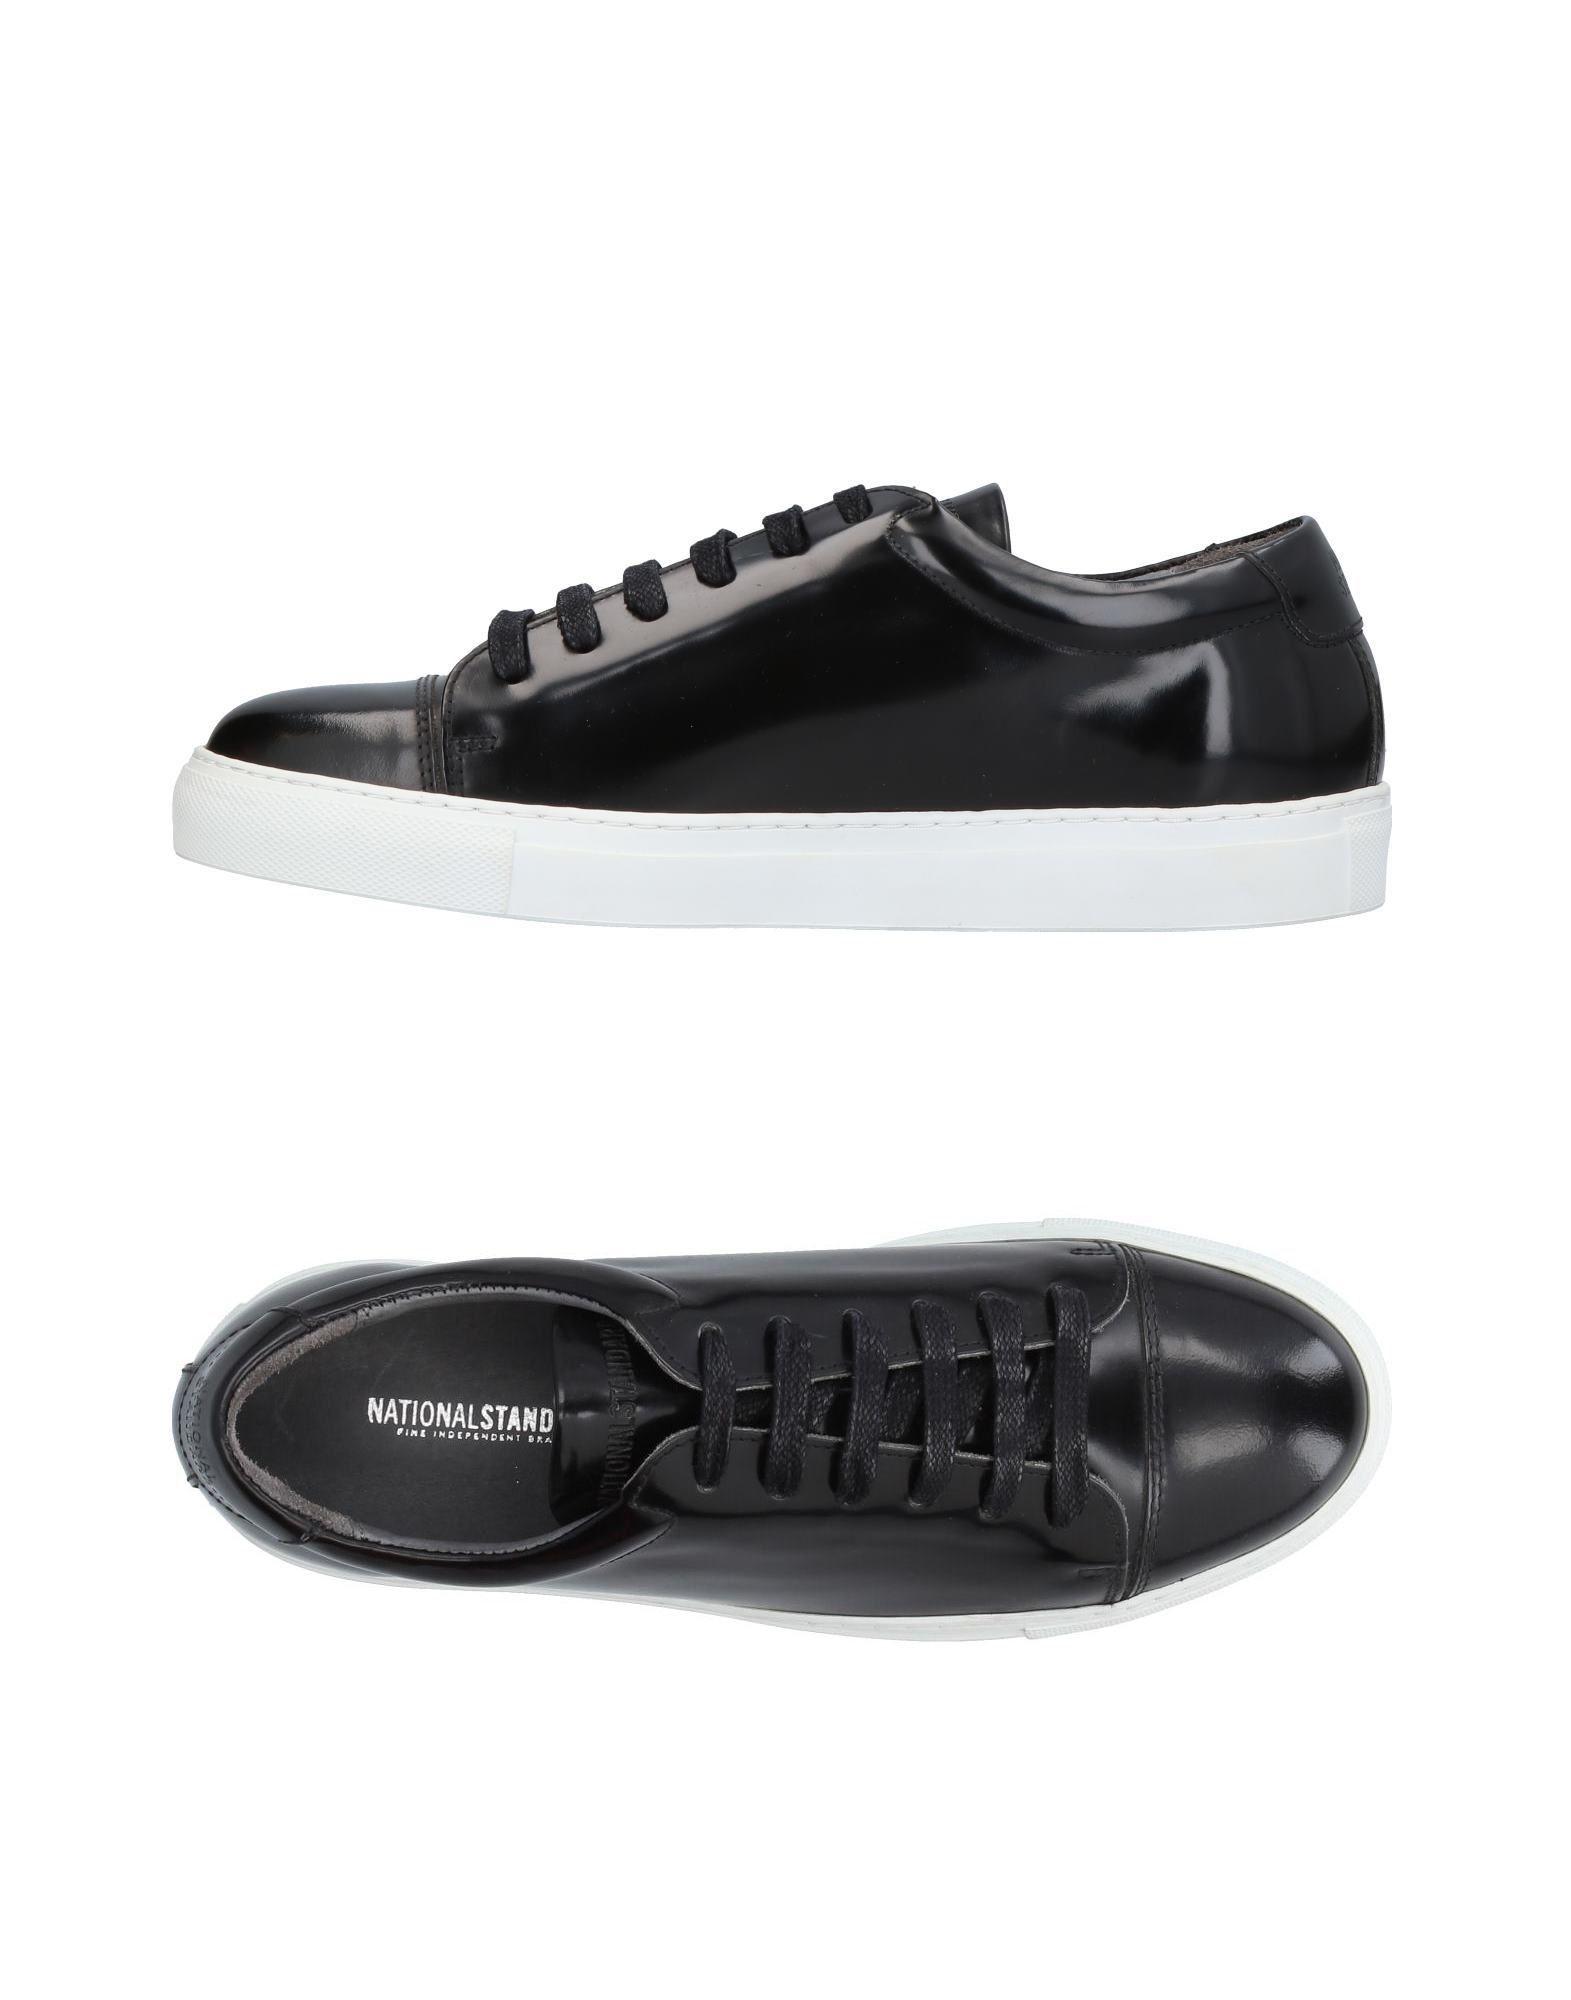 National Standard Sneakers Herren  11374969FK Gute Qualität beliebte Schuhe